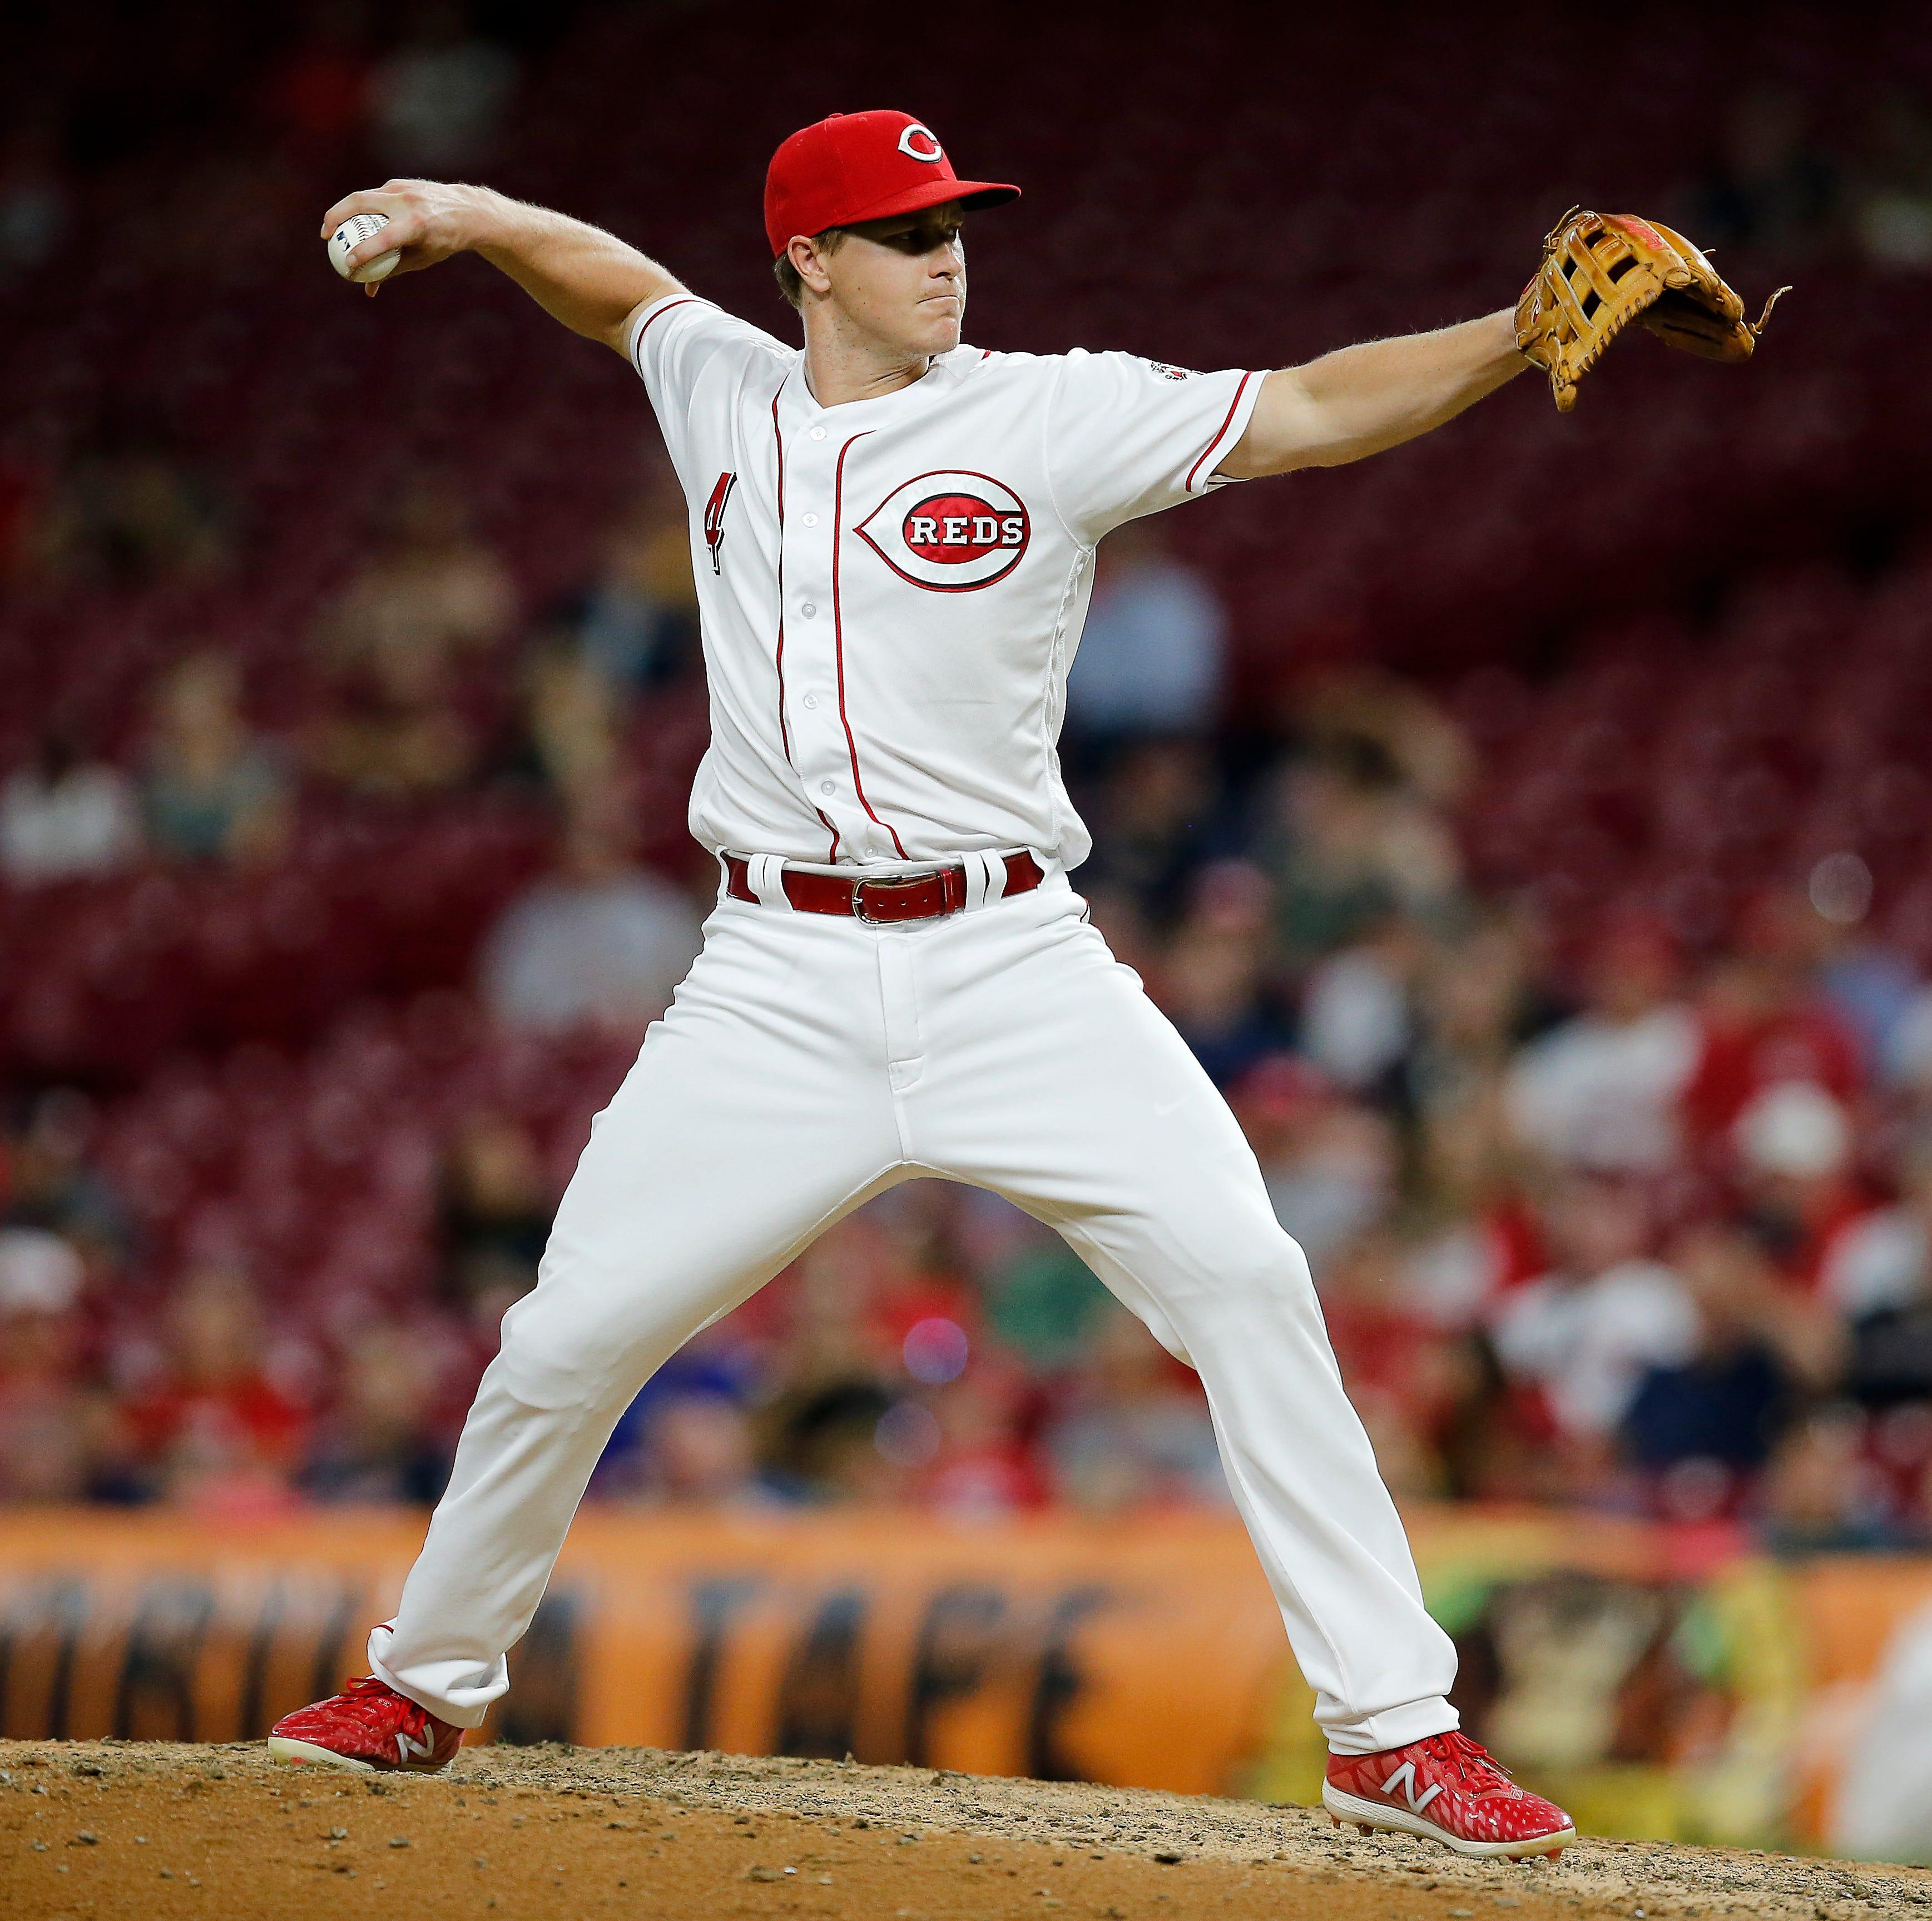 Brandon Dixon strikes out Jose Ramirez in Cincinnati Reds loss to Cleveland Indians